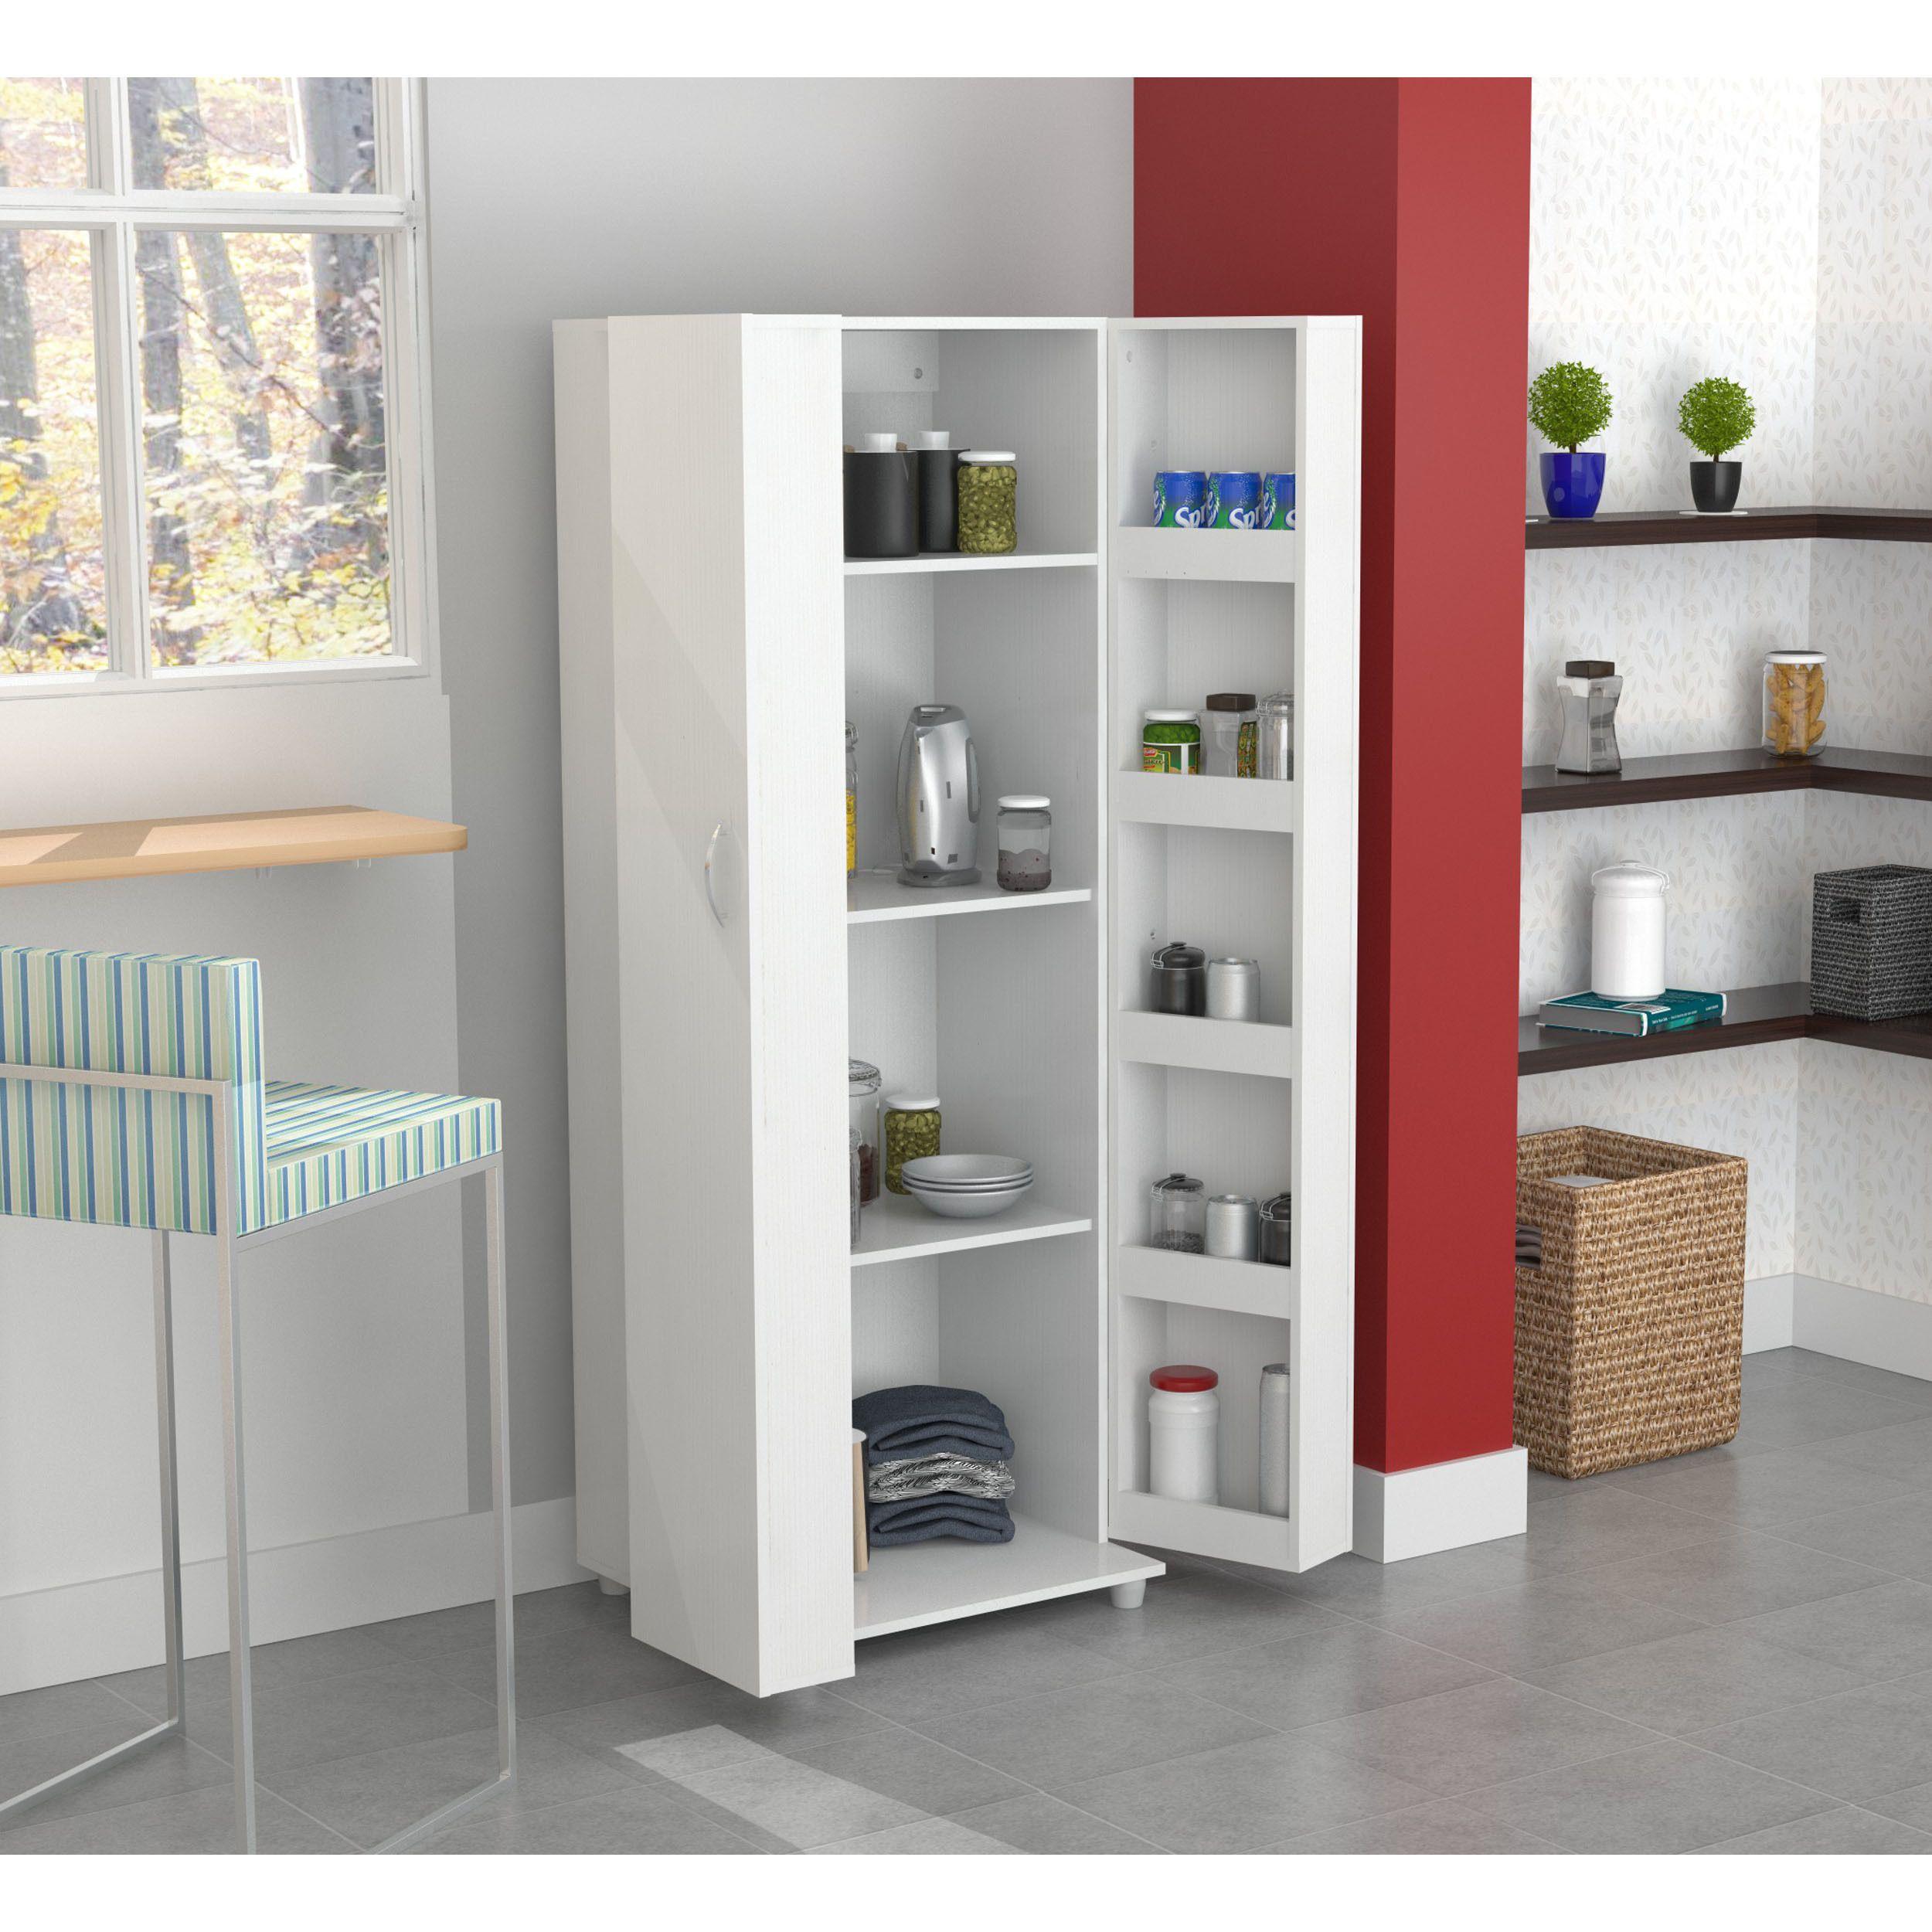 Add storage to your kitchen with the Laricina white Kitchen Storage